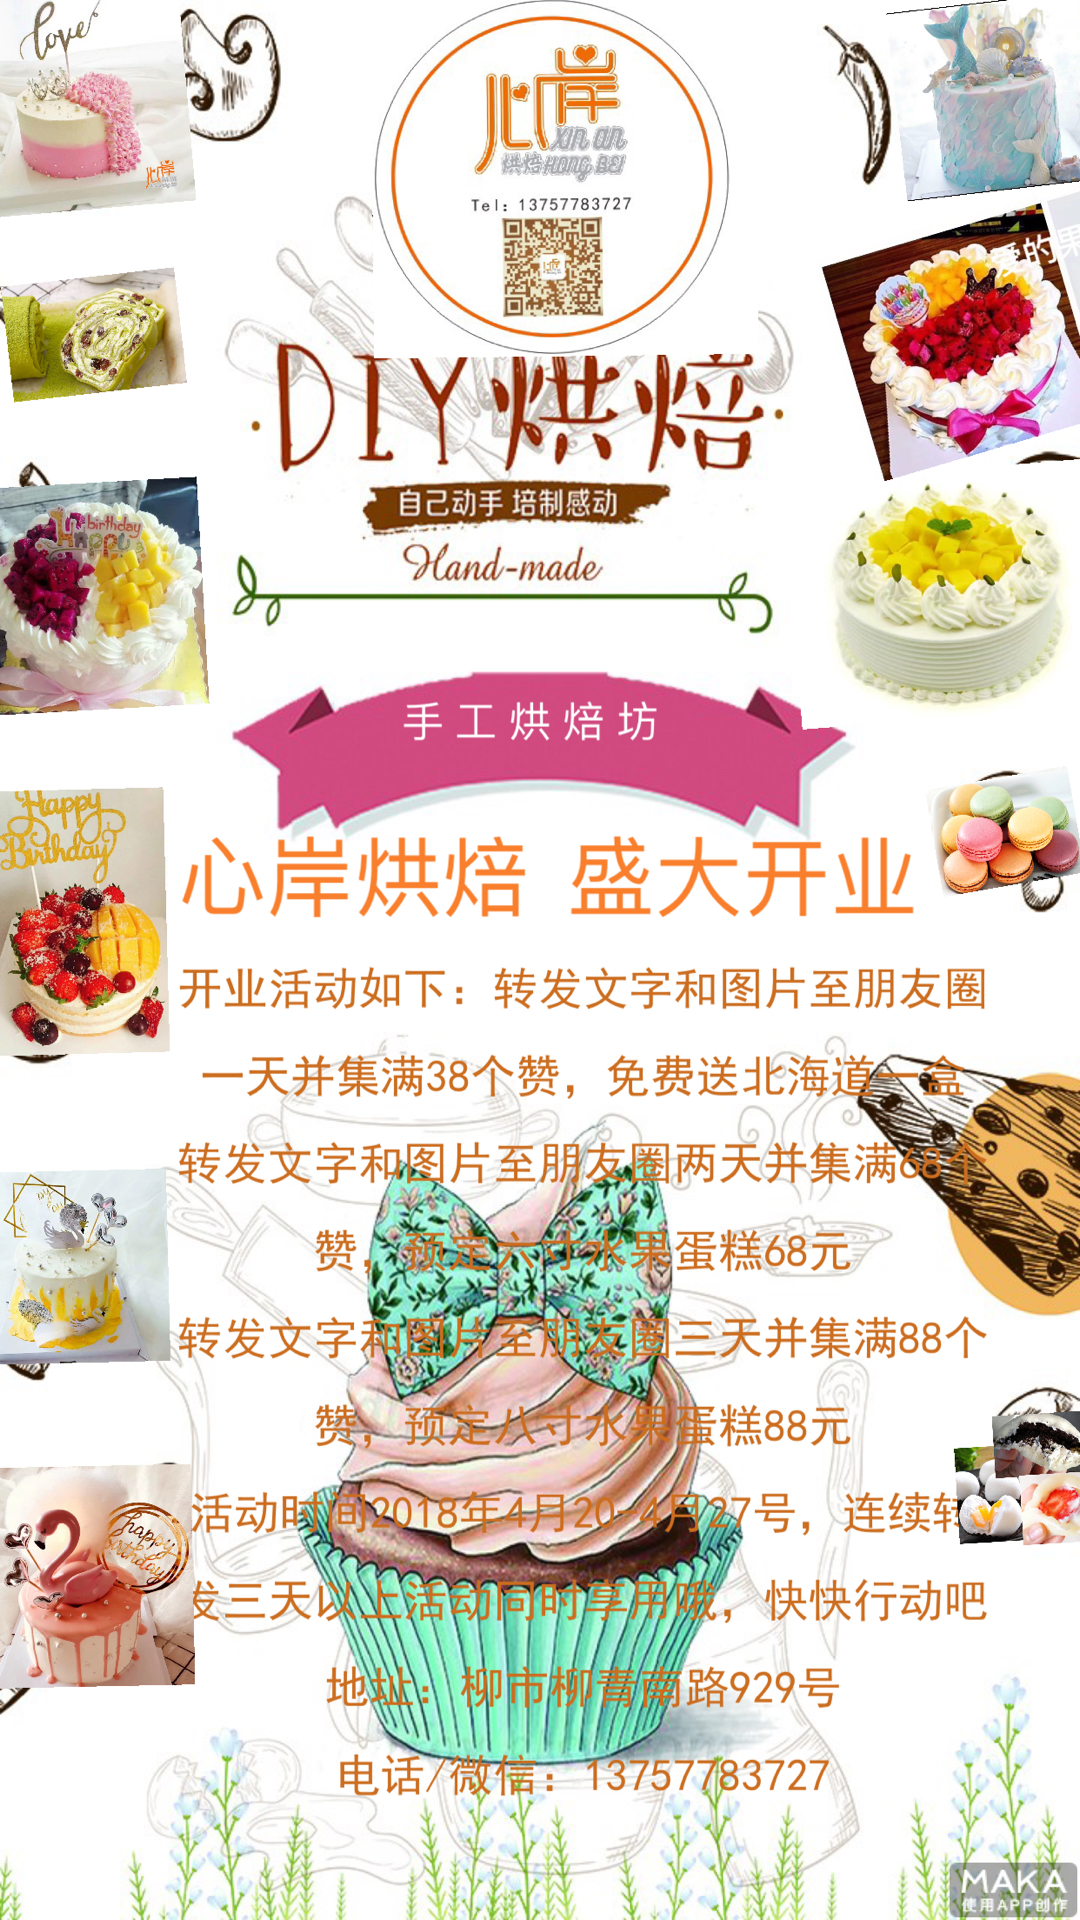 diy烘焙蛋糕店宣傳海報